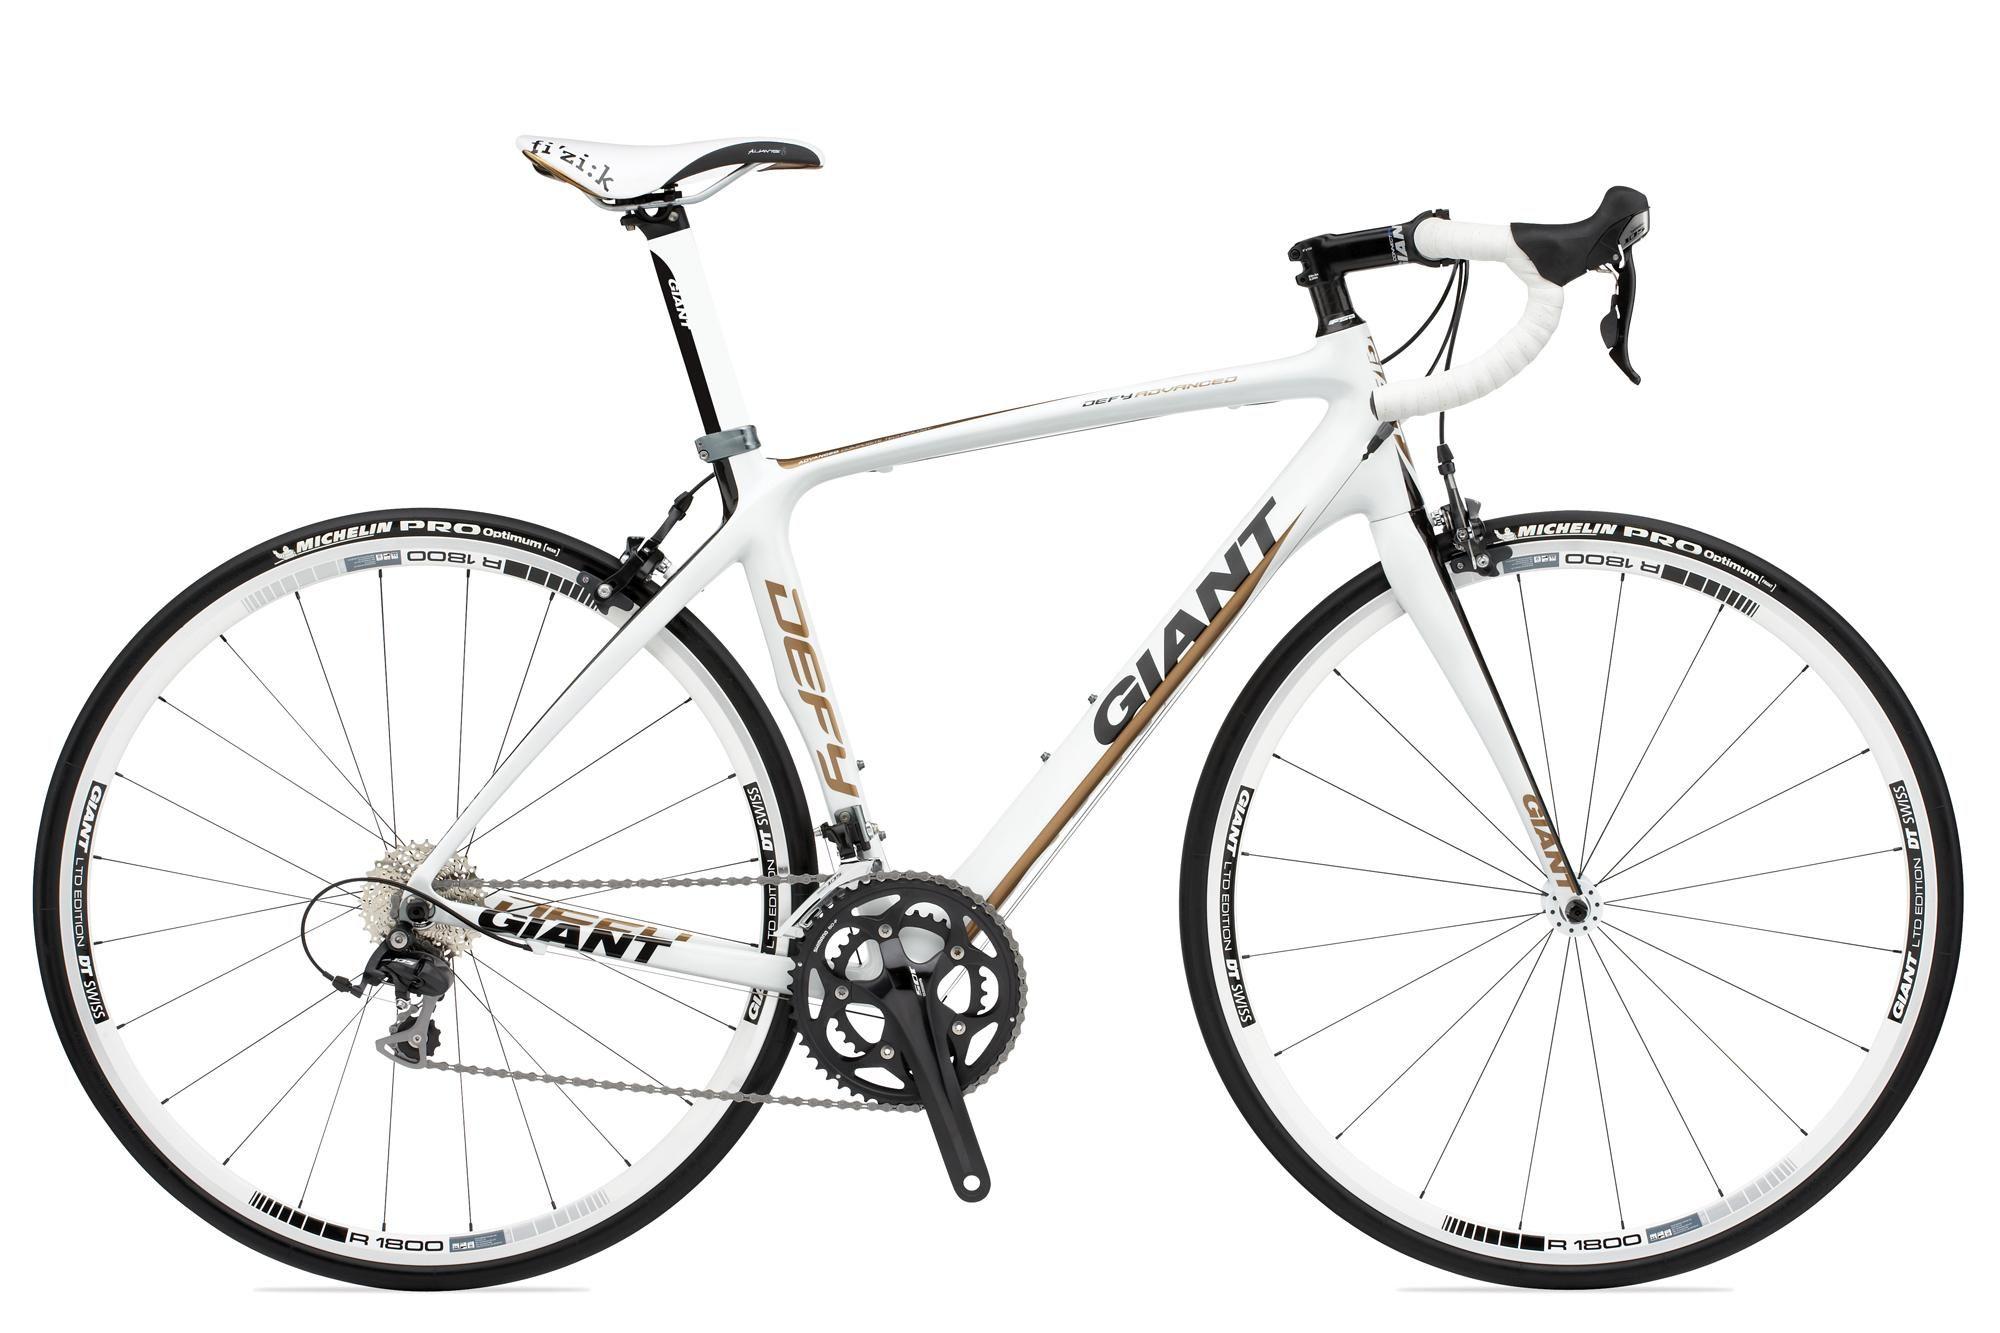 Giant Defy 2 Advanced Giant Bicycle Bike Bike Tour